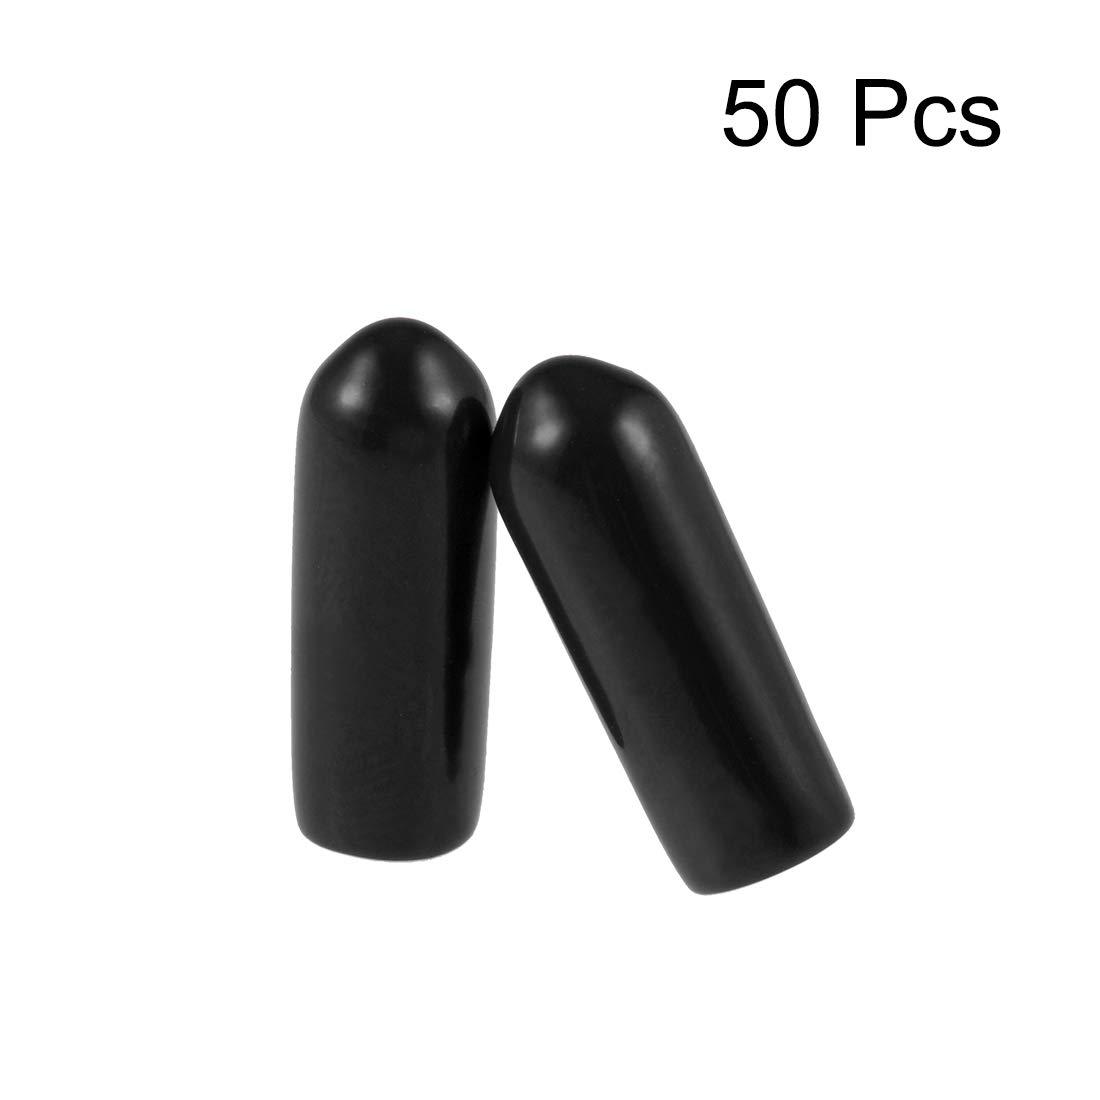 uxcell Screw Thread Protectors 2mm ID Round End Cap Cover Black Flexible Tube Caps Tubing Tip 50pcs